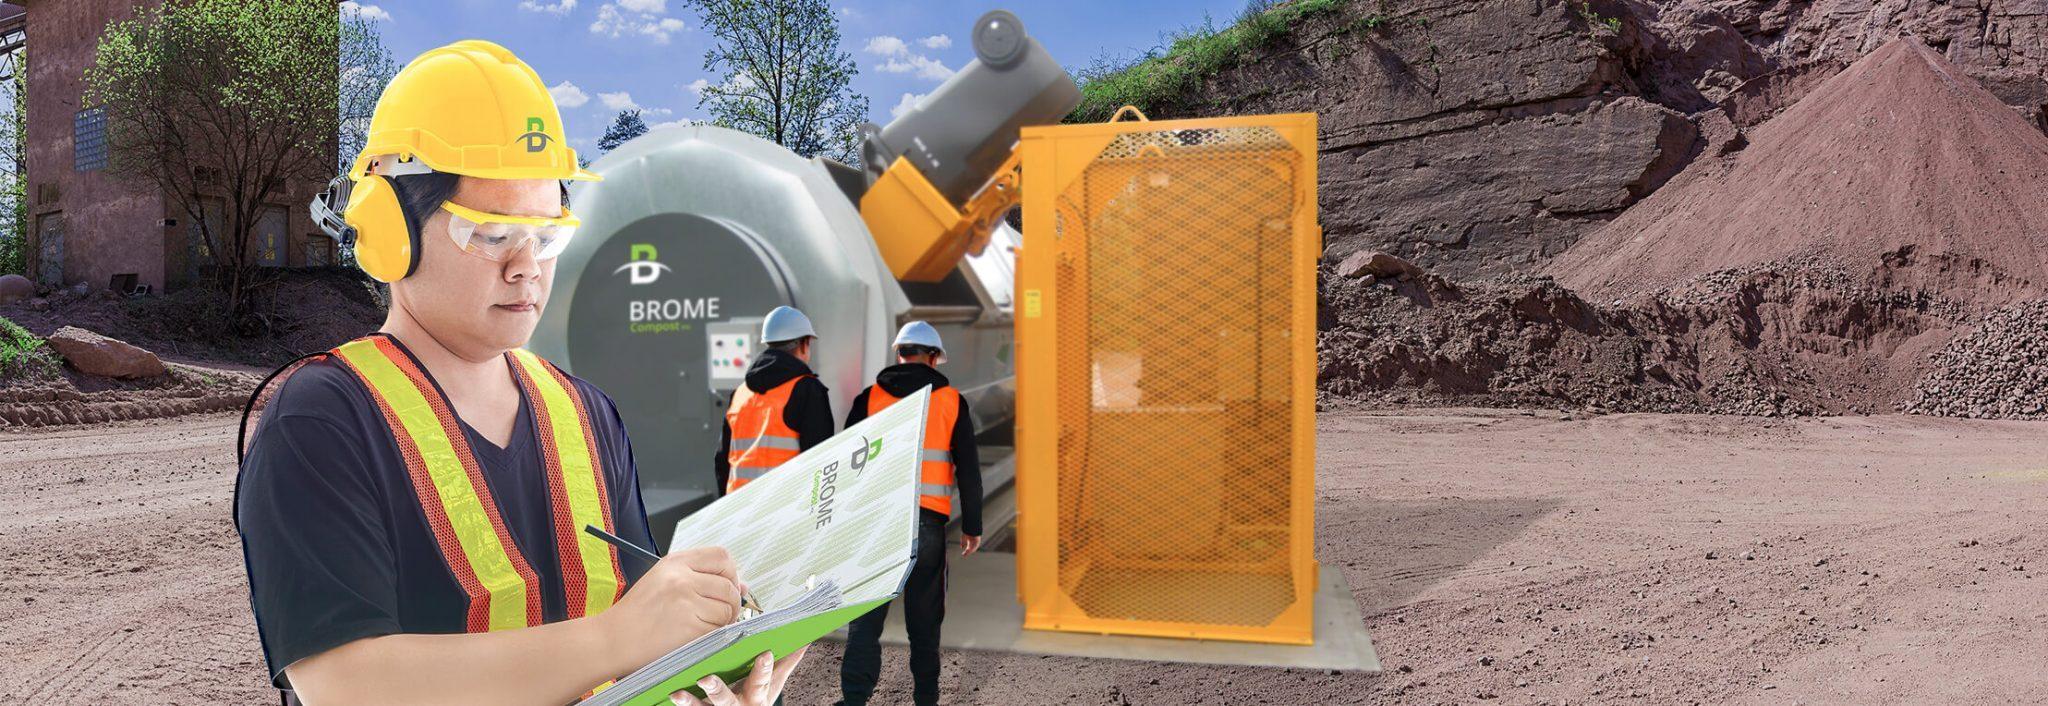 Compostage_site_Mines_brome_compost_Composting_on-site_mine